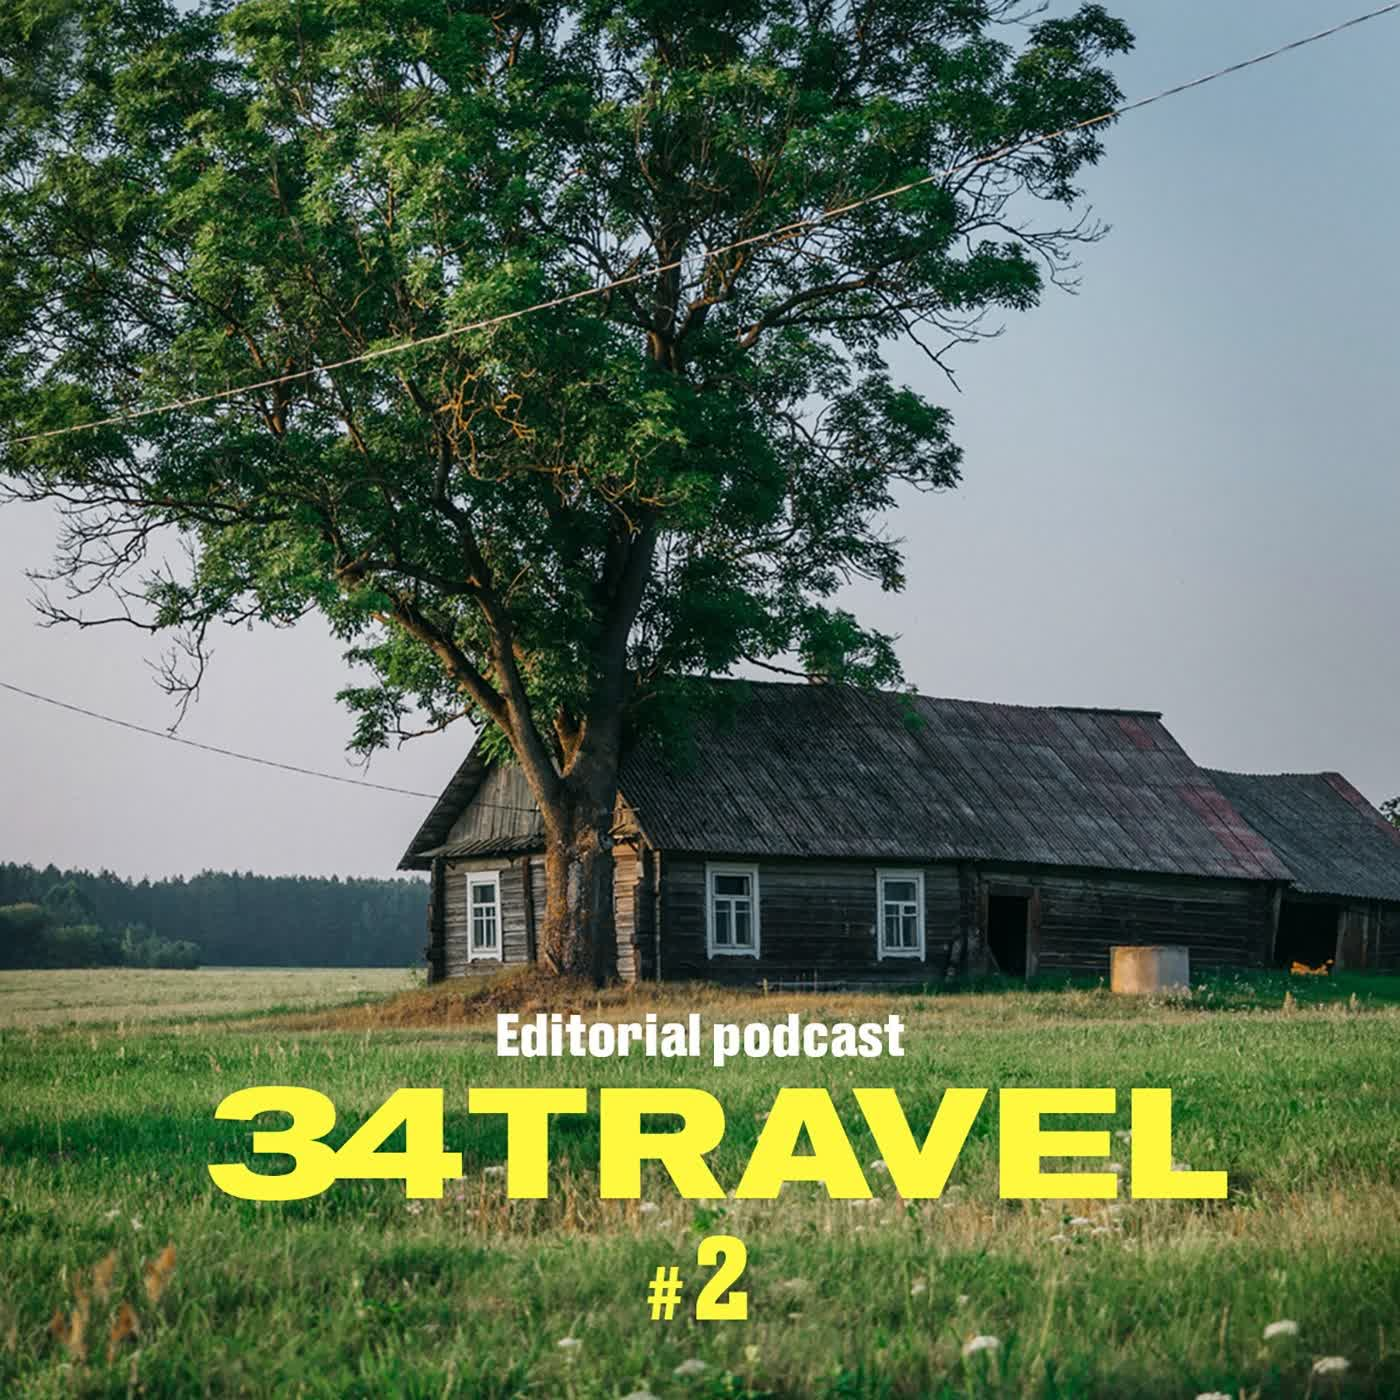 34travel Editorial Podcast #2: Как путешествовать по Беларуси?